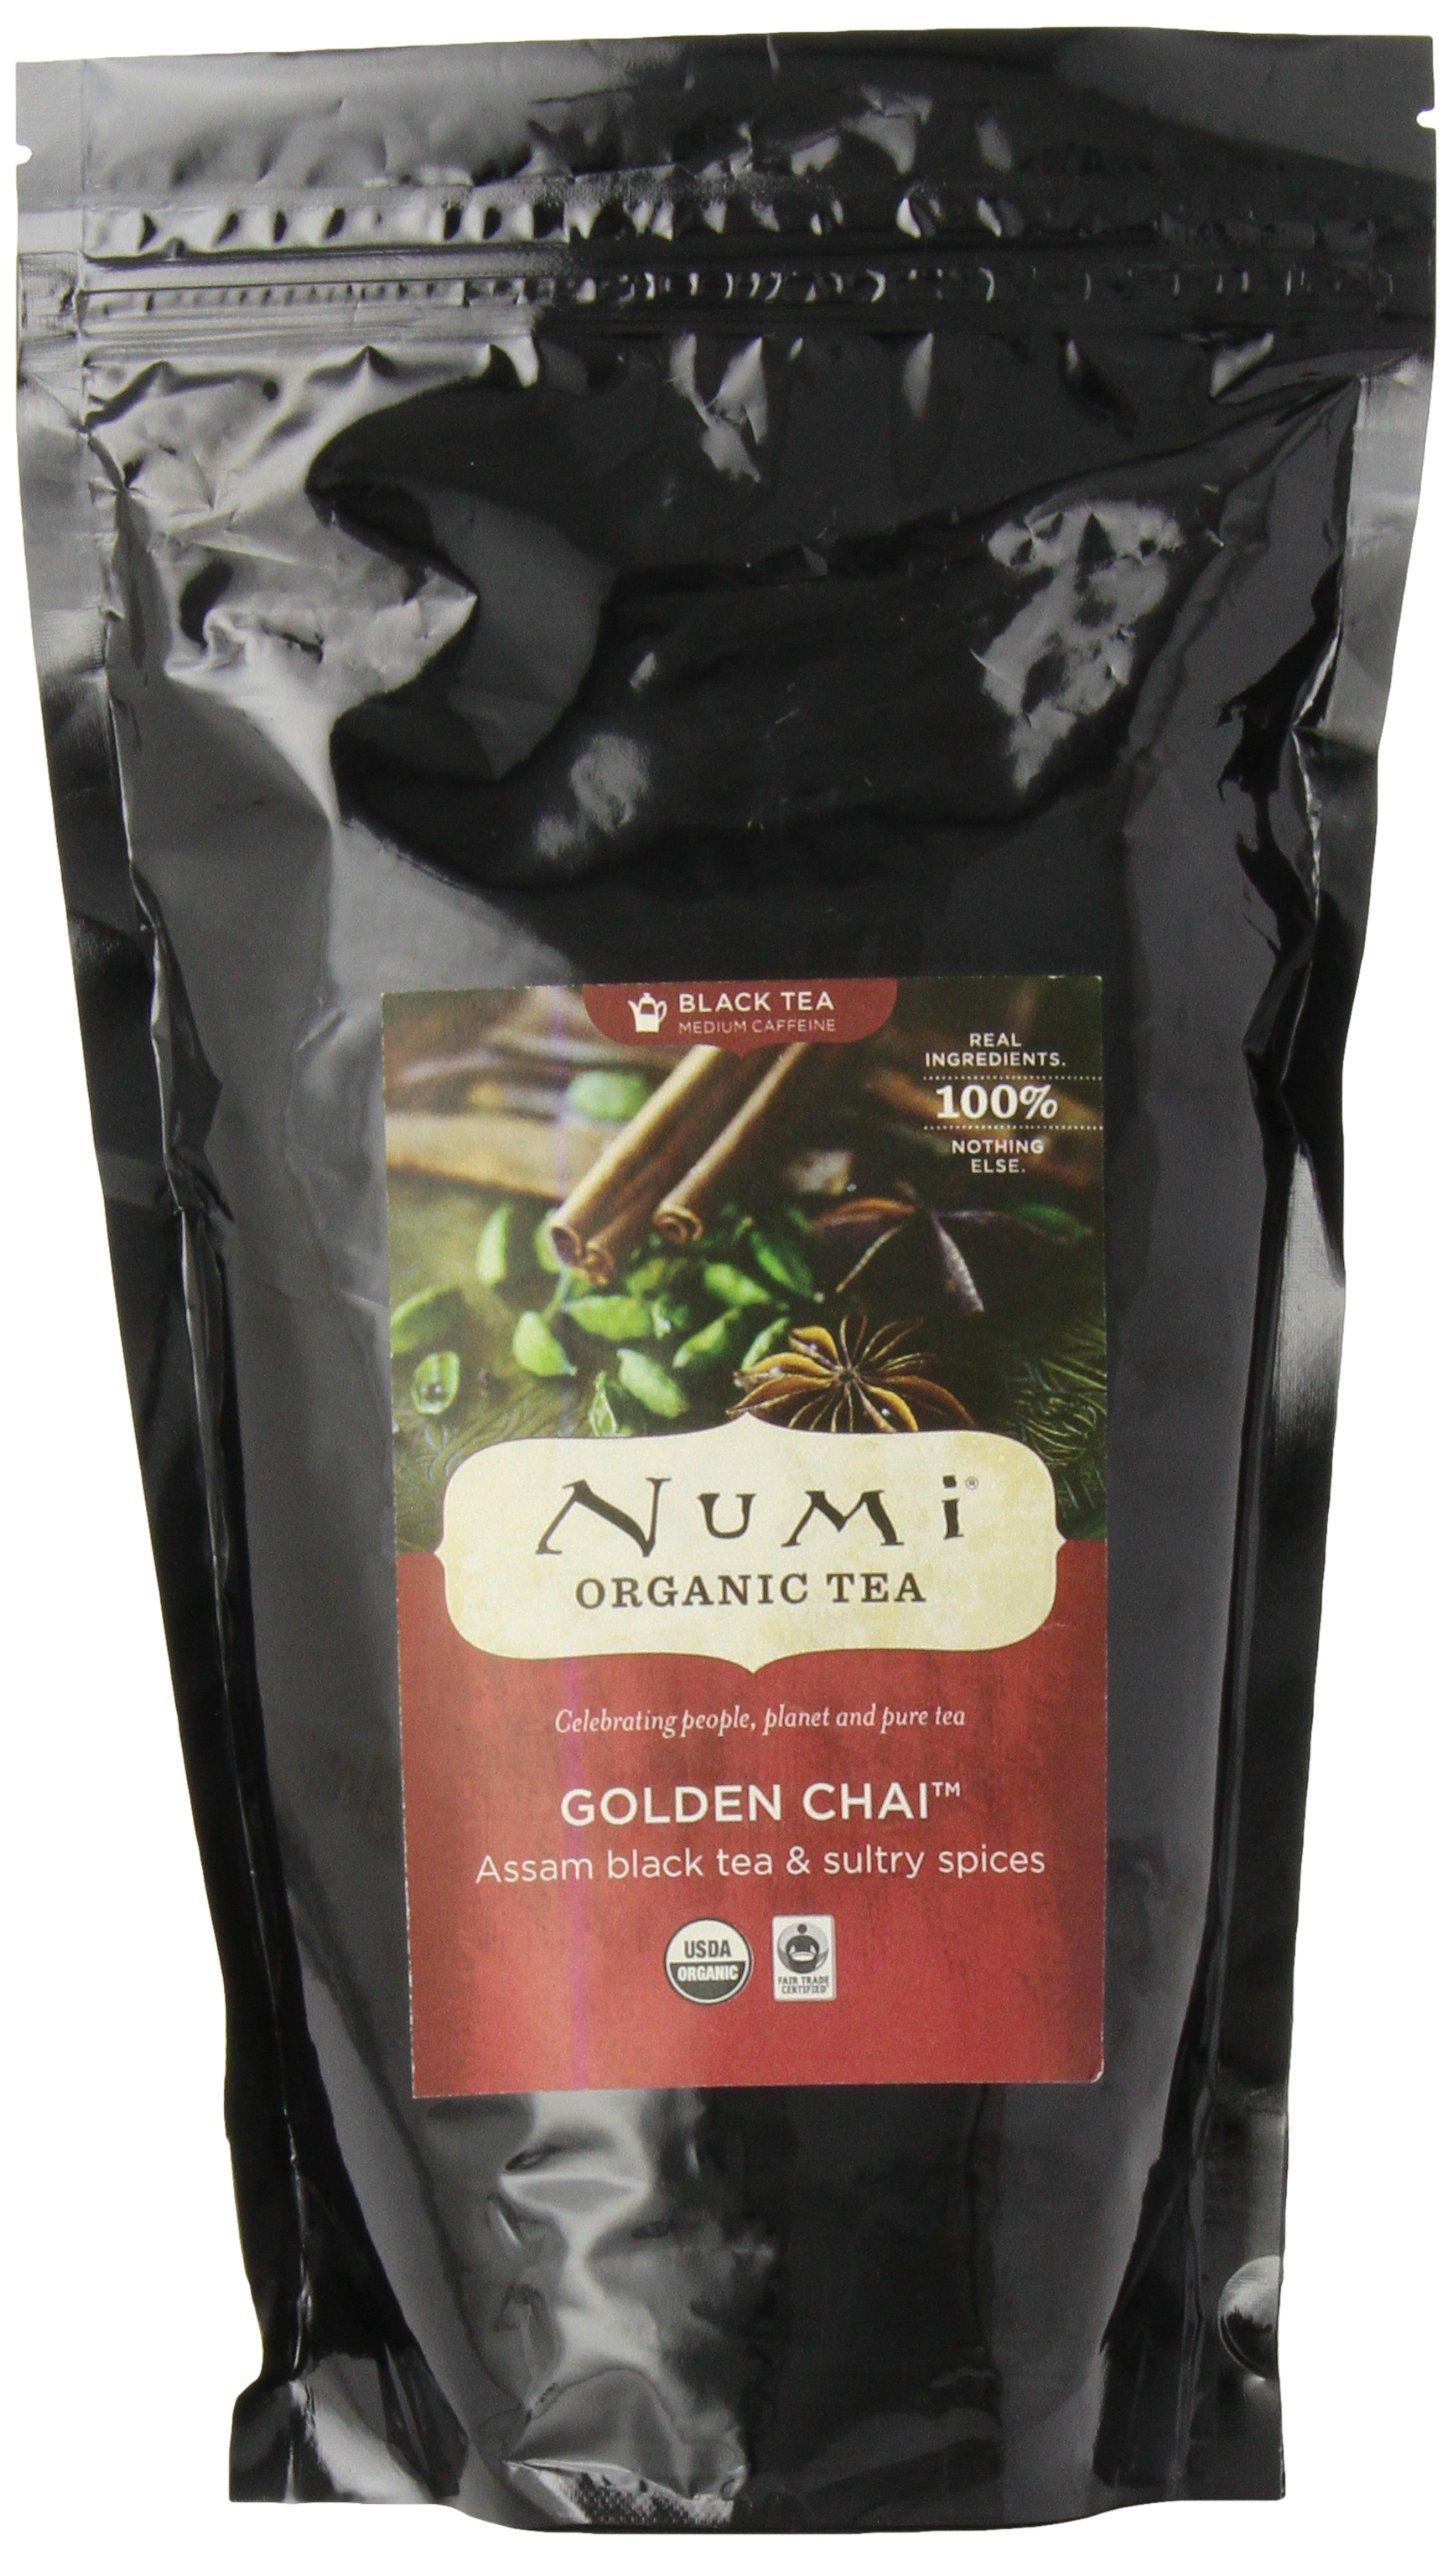 Numi Organic Tea Golden Chai, 16 Ounce Pouch (Pack of 6), Loose Leaf Black Tea